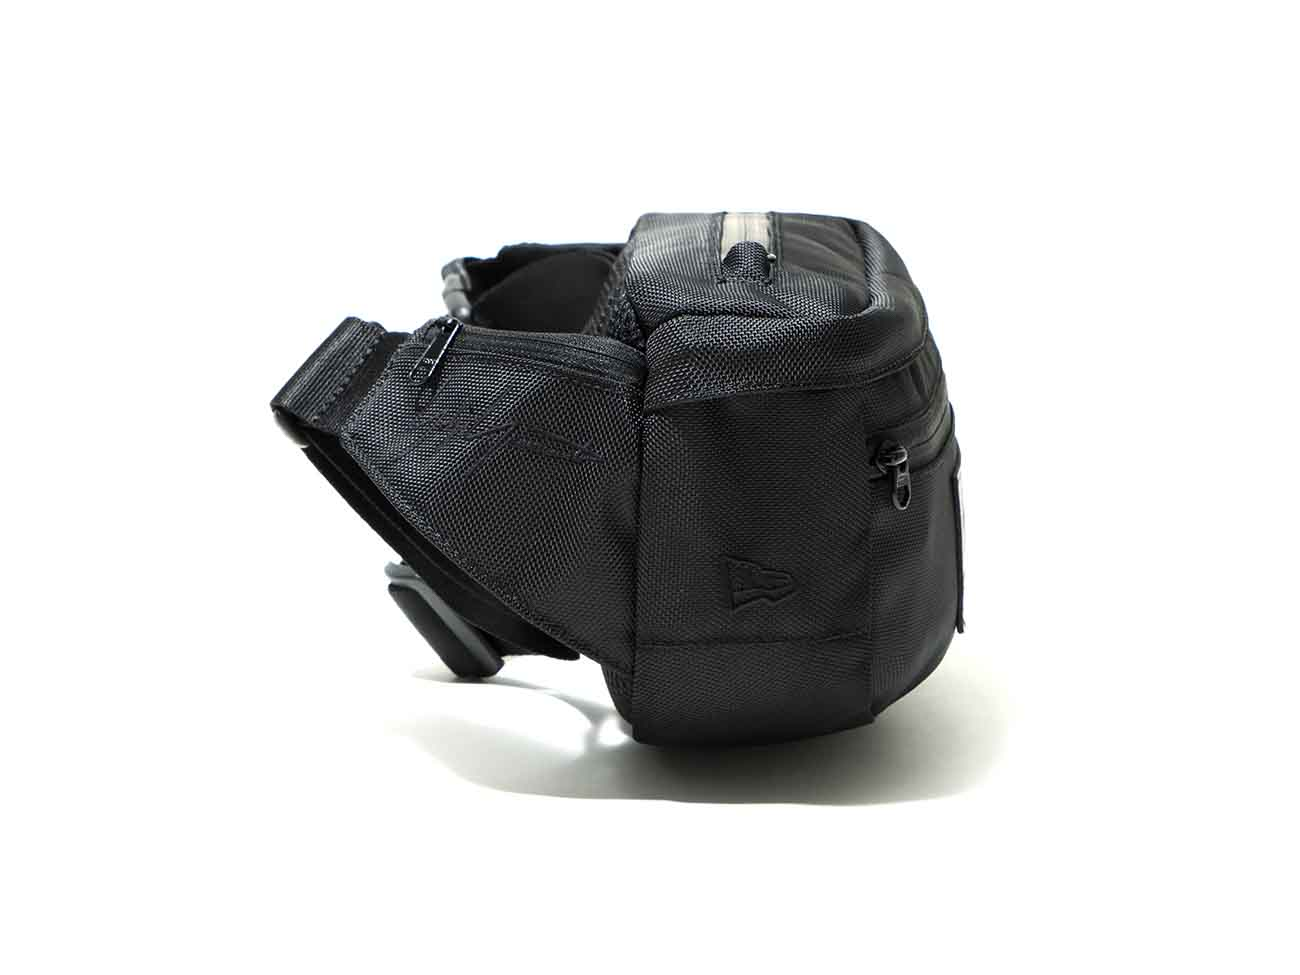 Yohji Yamamoto × New Era 1680-BKPE-B EXPLORER WAIST BAG